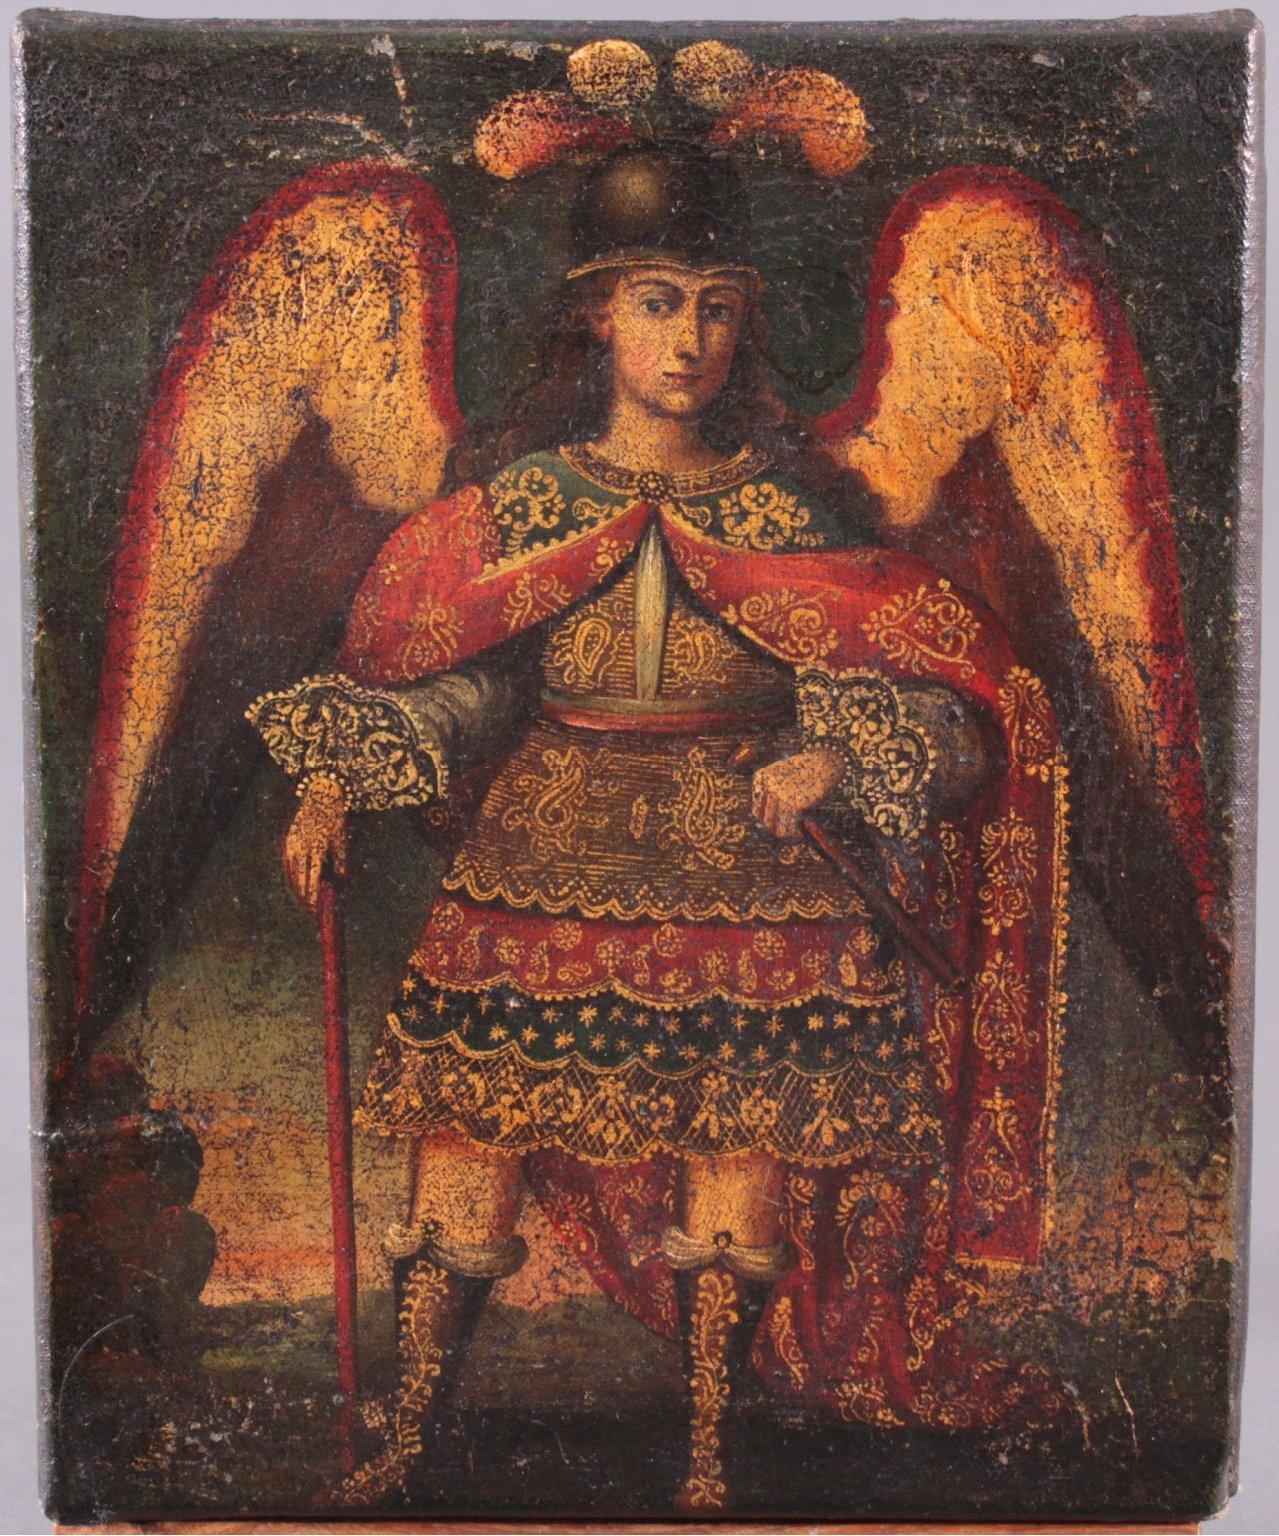 Künstler des 16./17. Jahrhundert. Erzengel Michael